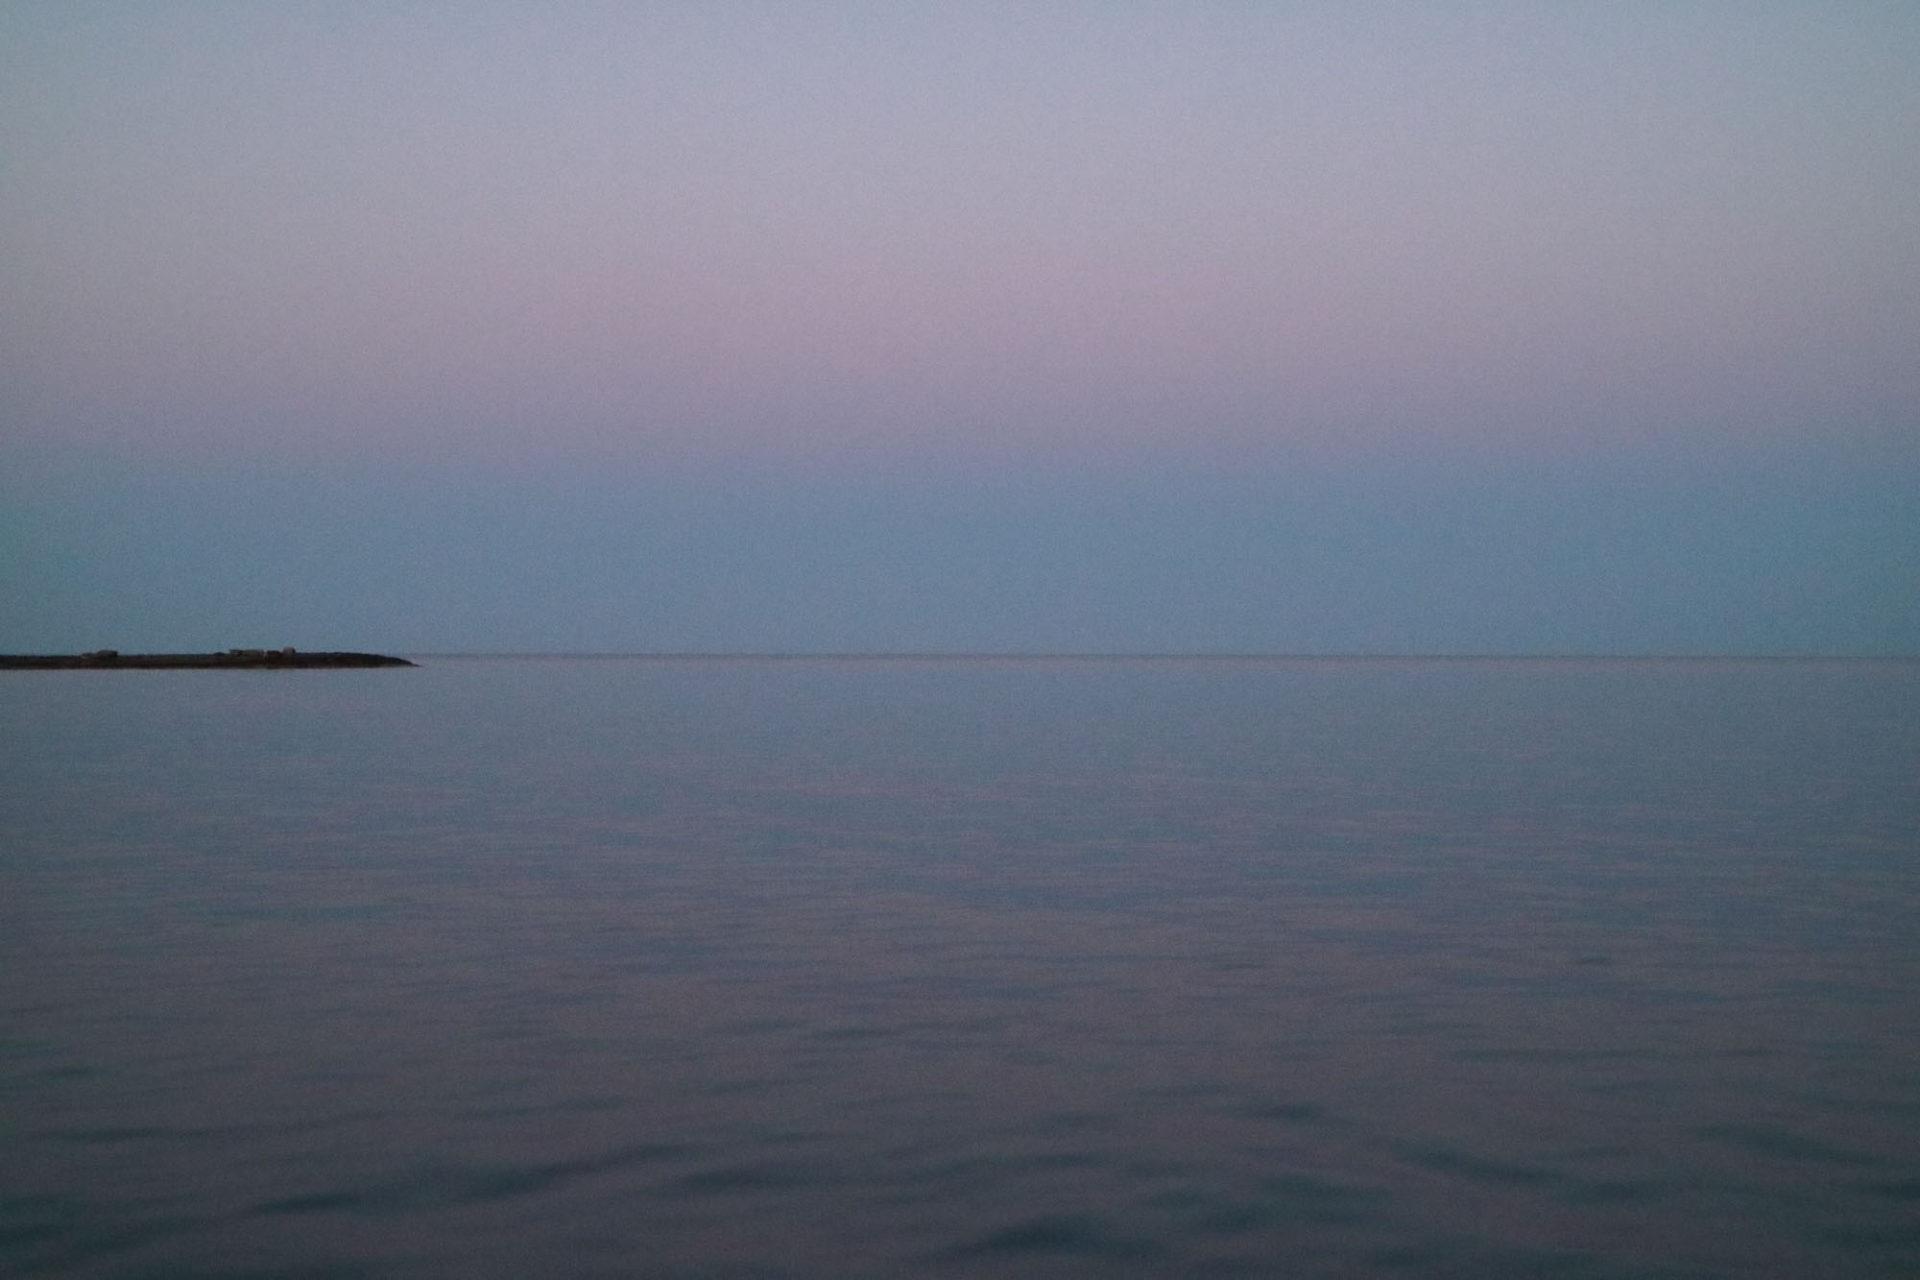 Fotografin - Daniela Hürlimann - Inselspitz Pastelltöne Meer Horizont